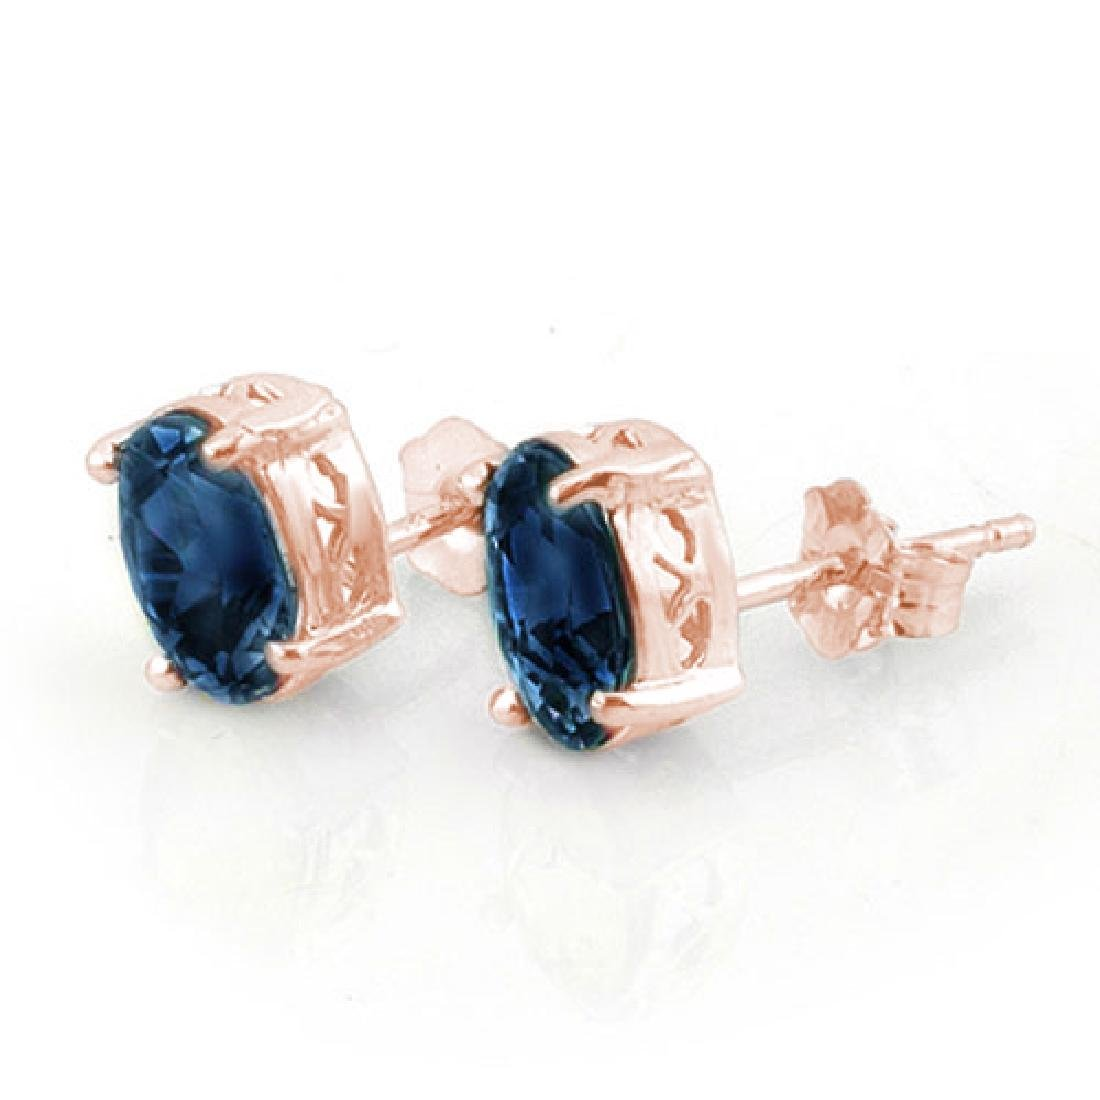 3.0 CTW Blue Sapphire Earrings 14K Rose Gold